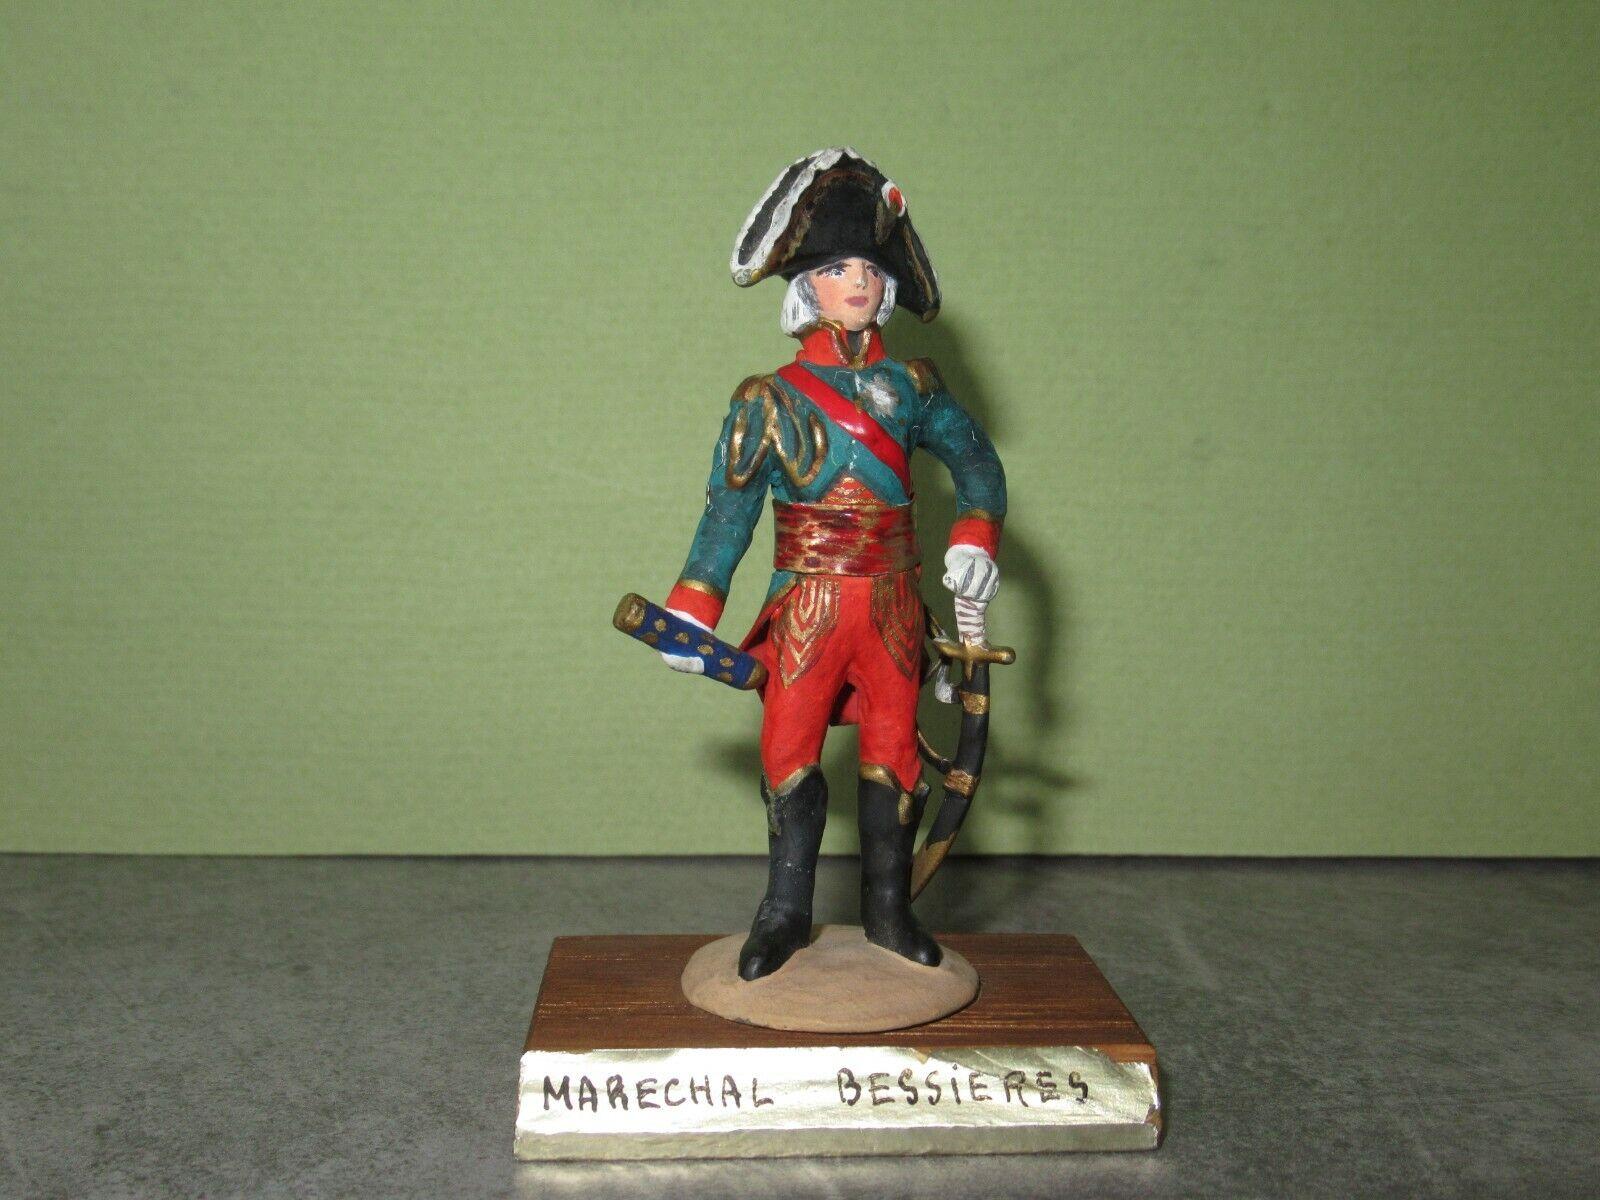 Estatua d artista Sam doute Guy Renaud = le marechhal bessieres